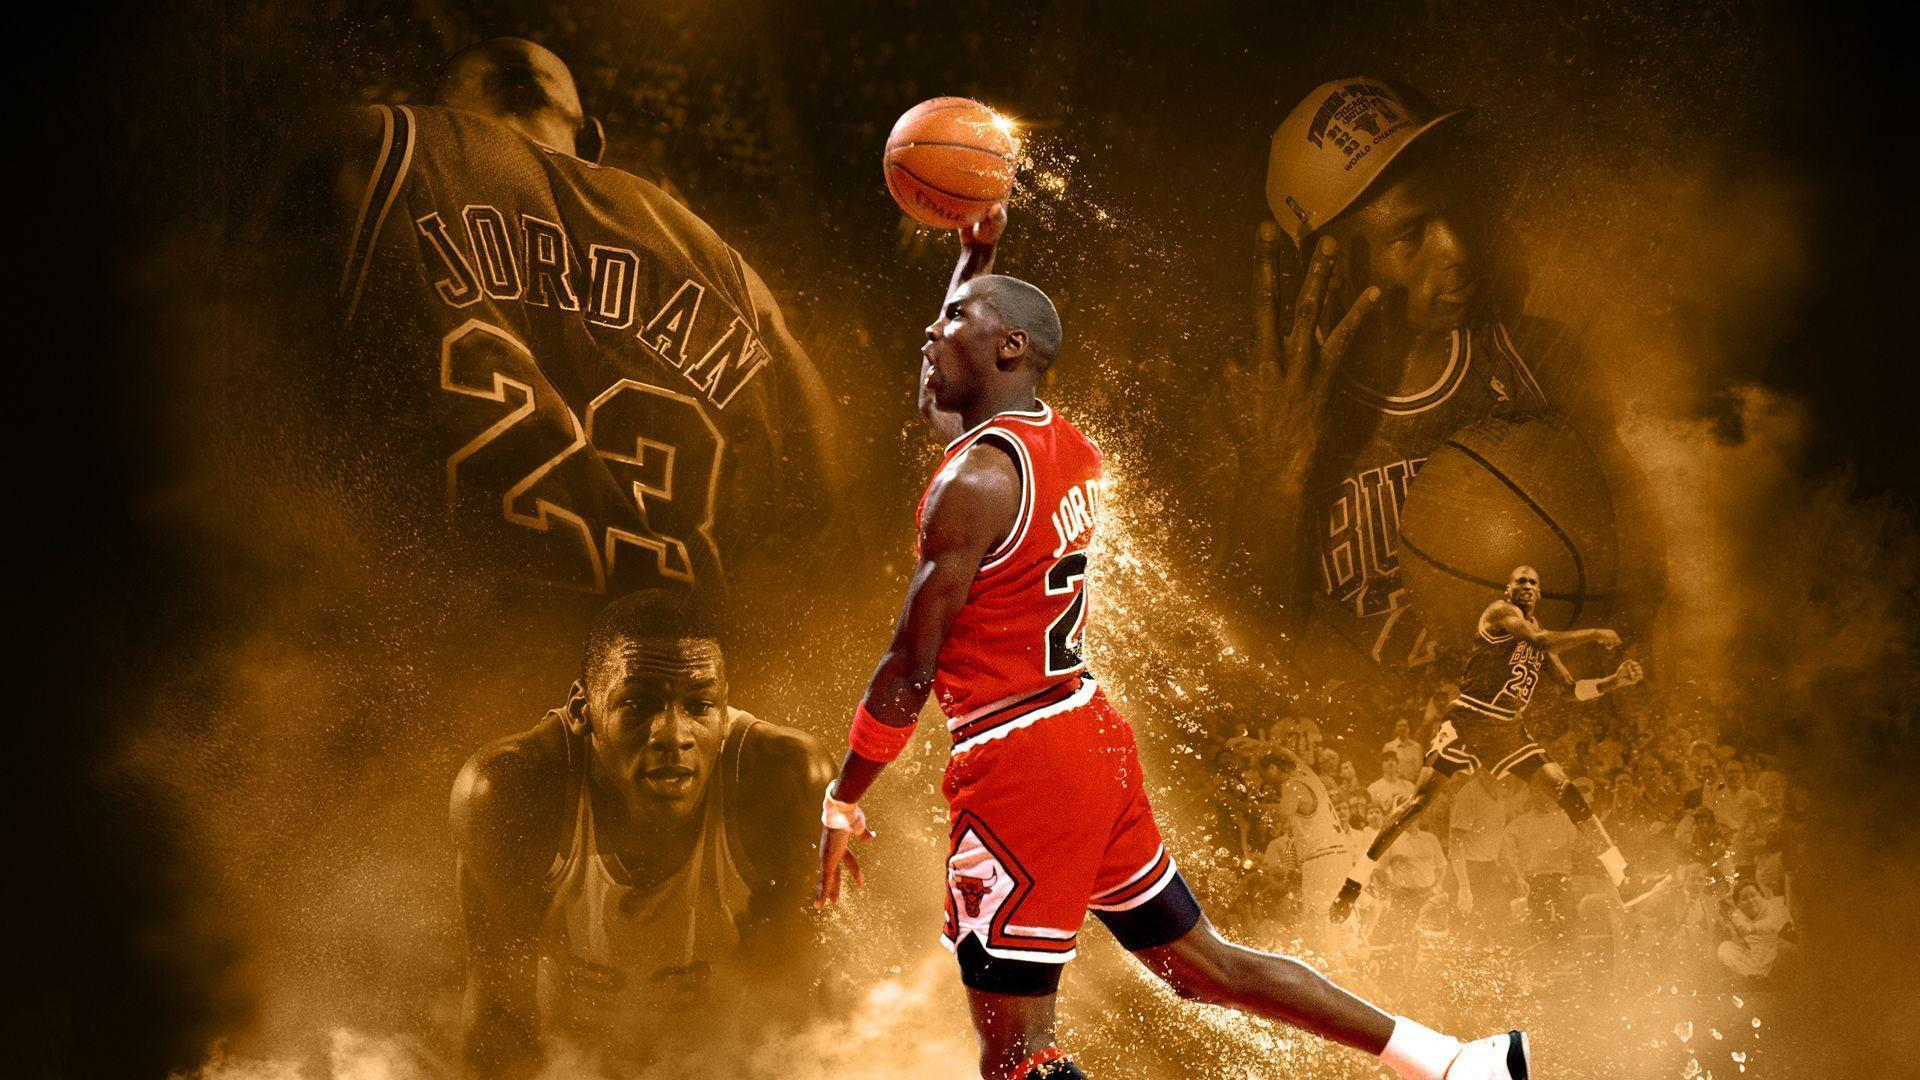 4K NBA Wallpapers   Top 4K NBA Backgrounds   WallpaperAccess 1920x1080